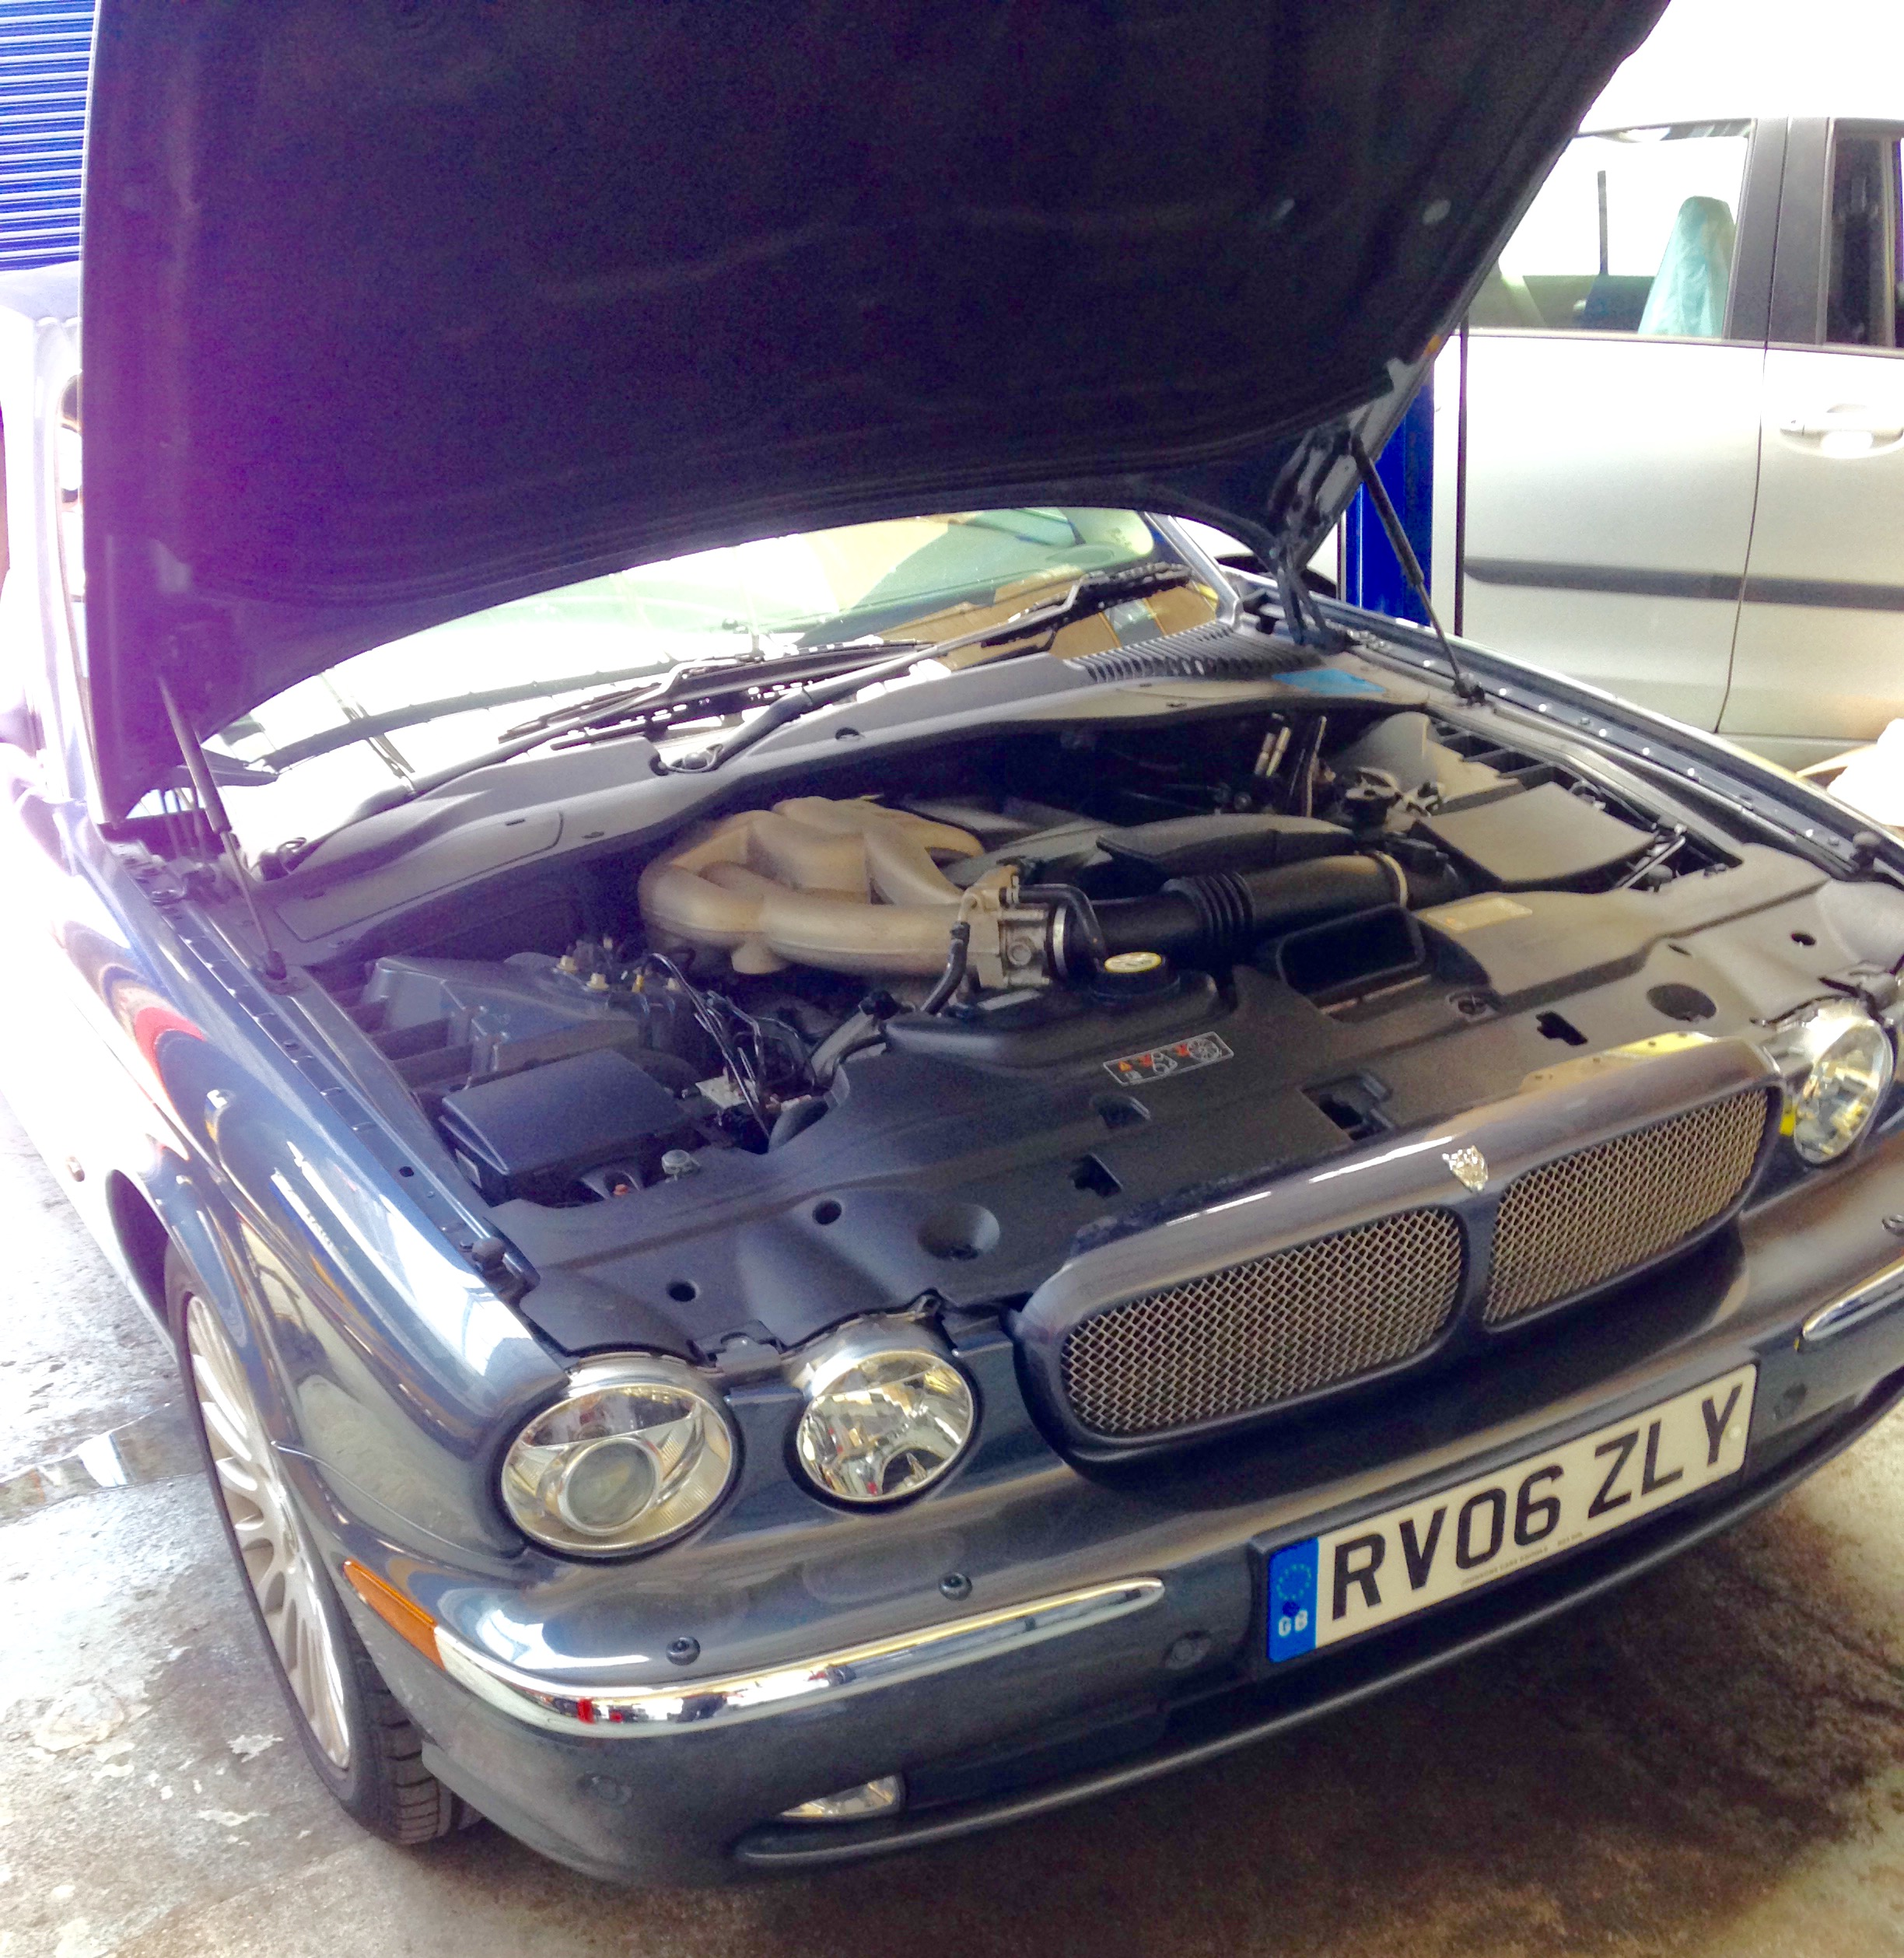 Jaguar Repair Swindon – XJ Gearbox oil change